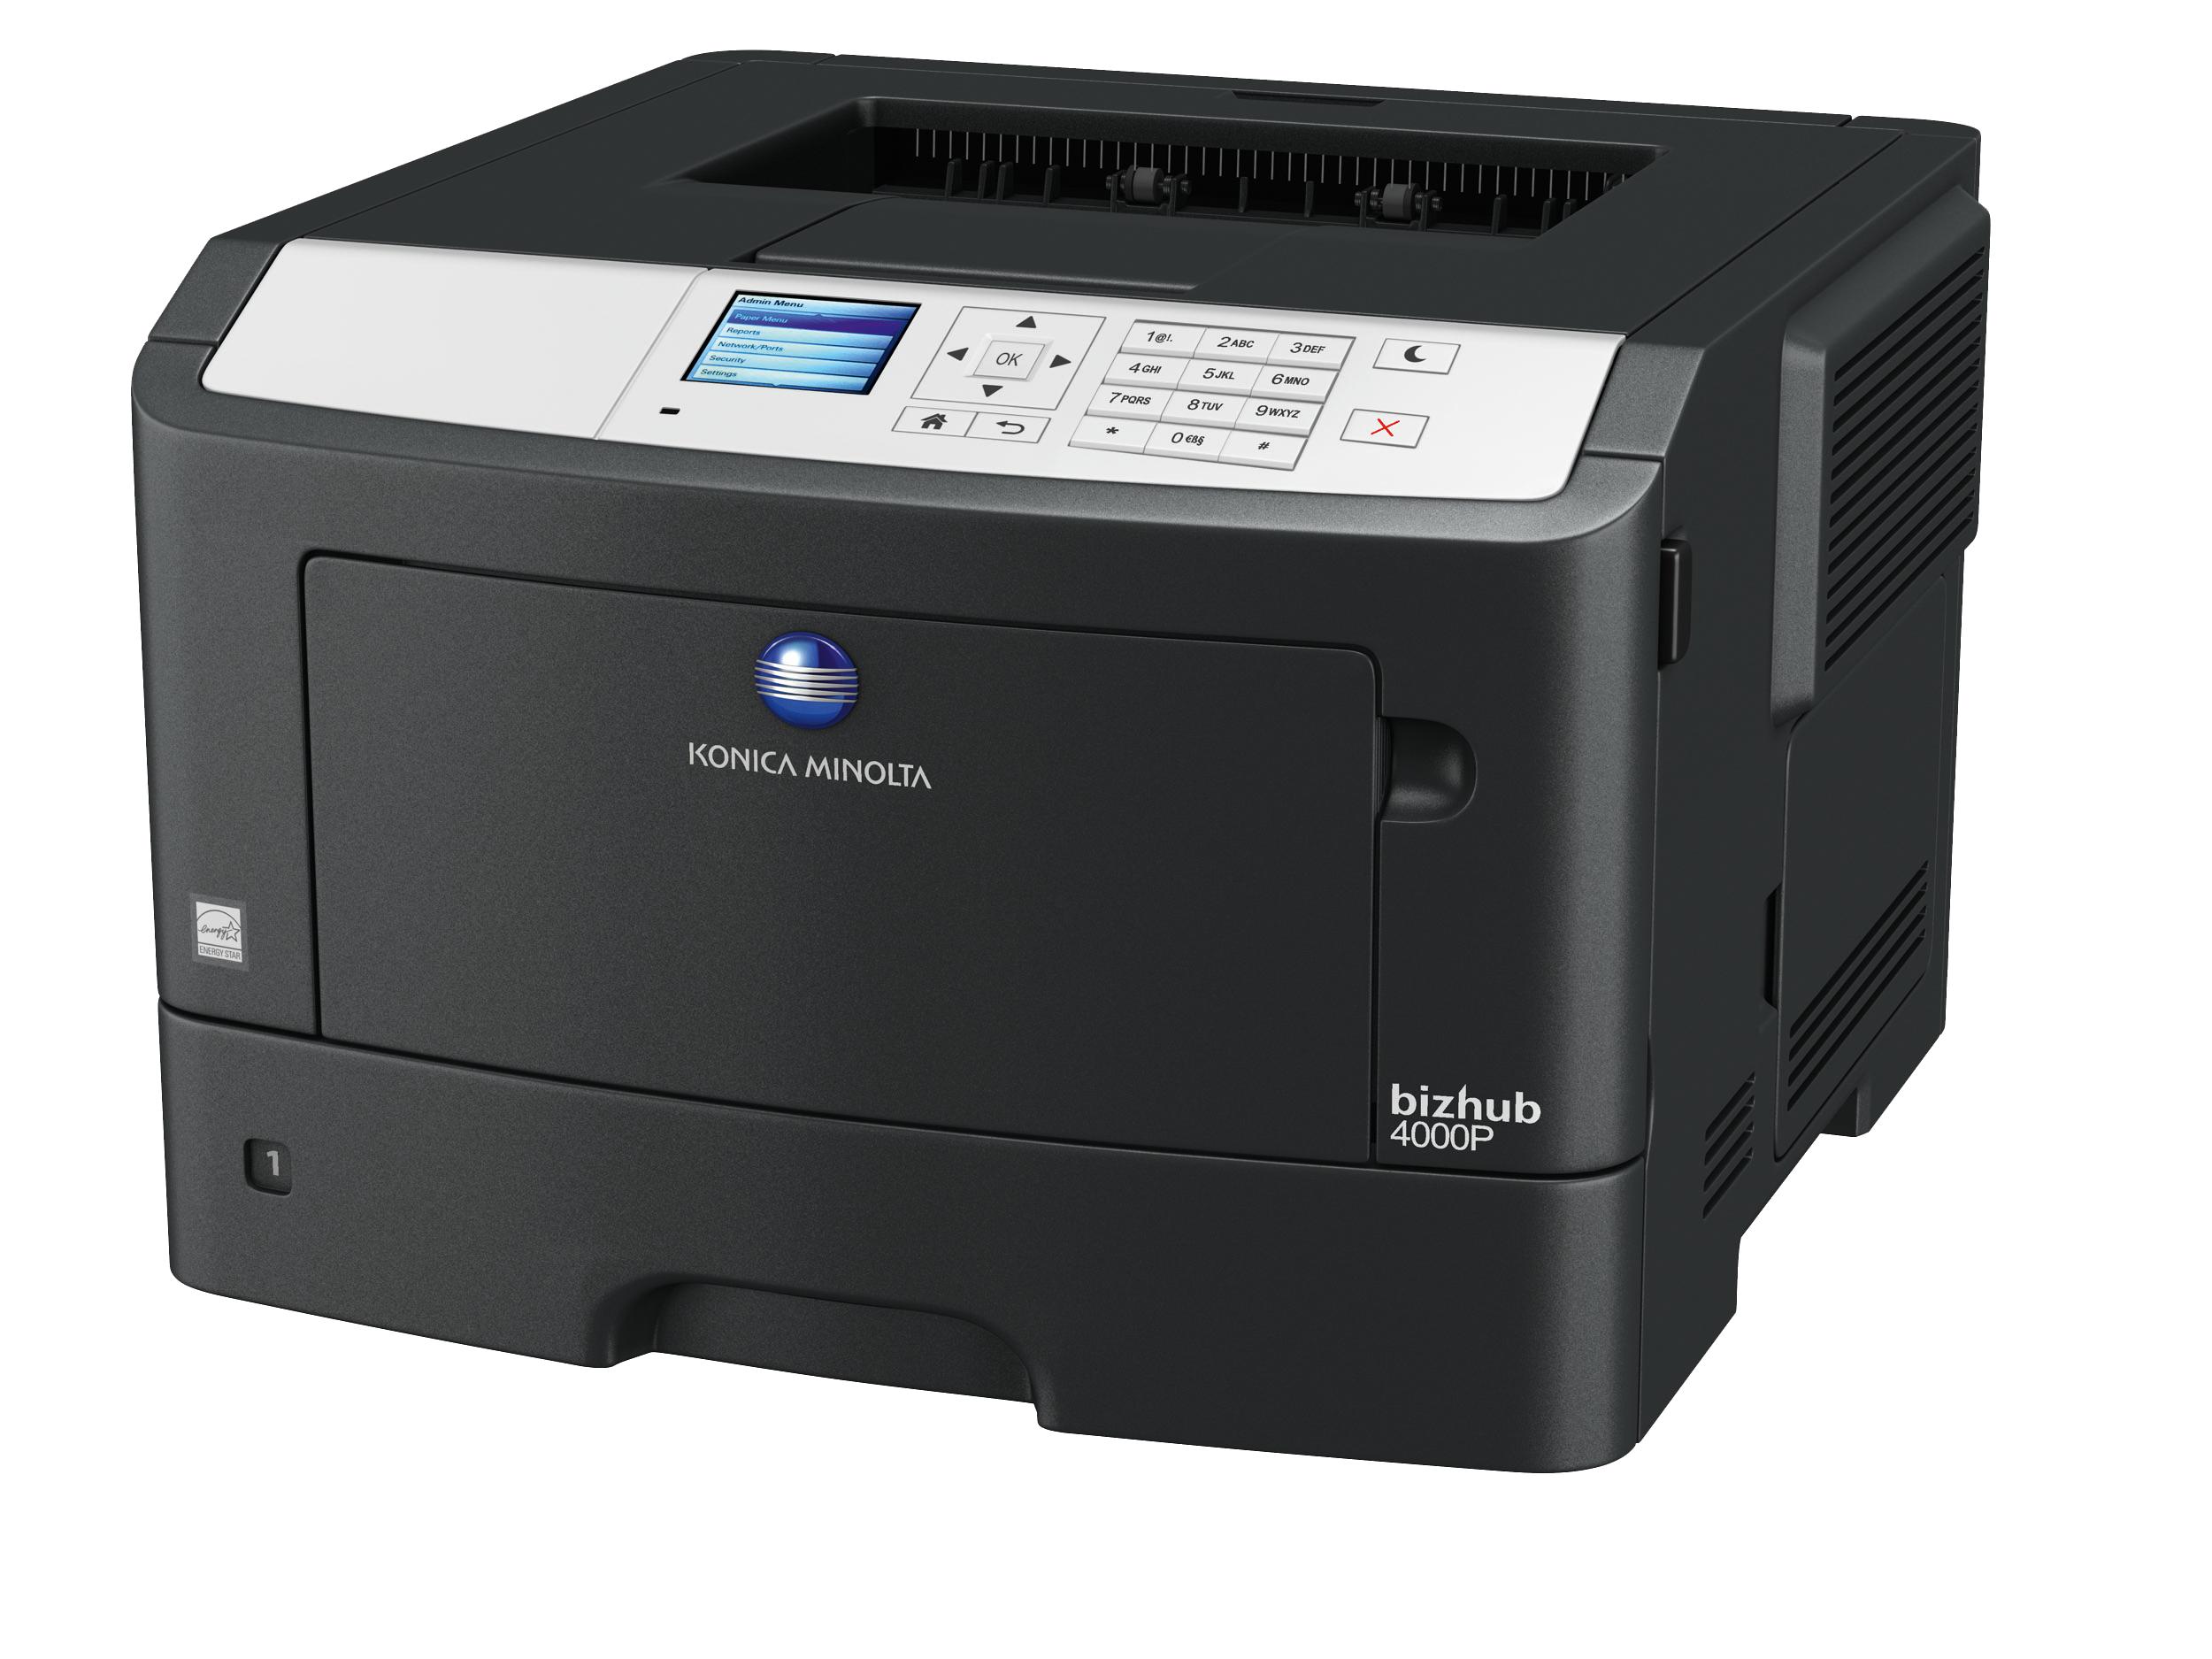 Принтер KONICA MINOLTA bizhub 4000P (A63R021)